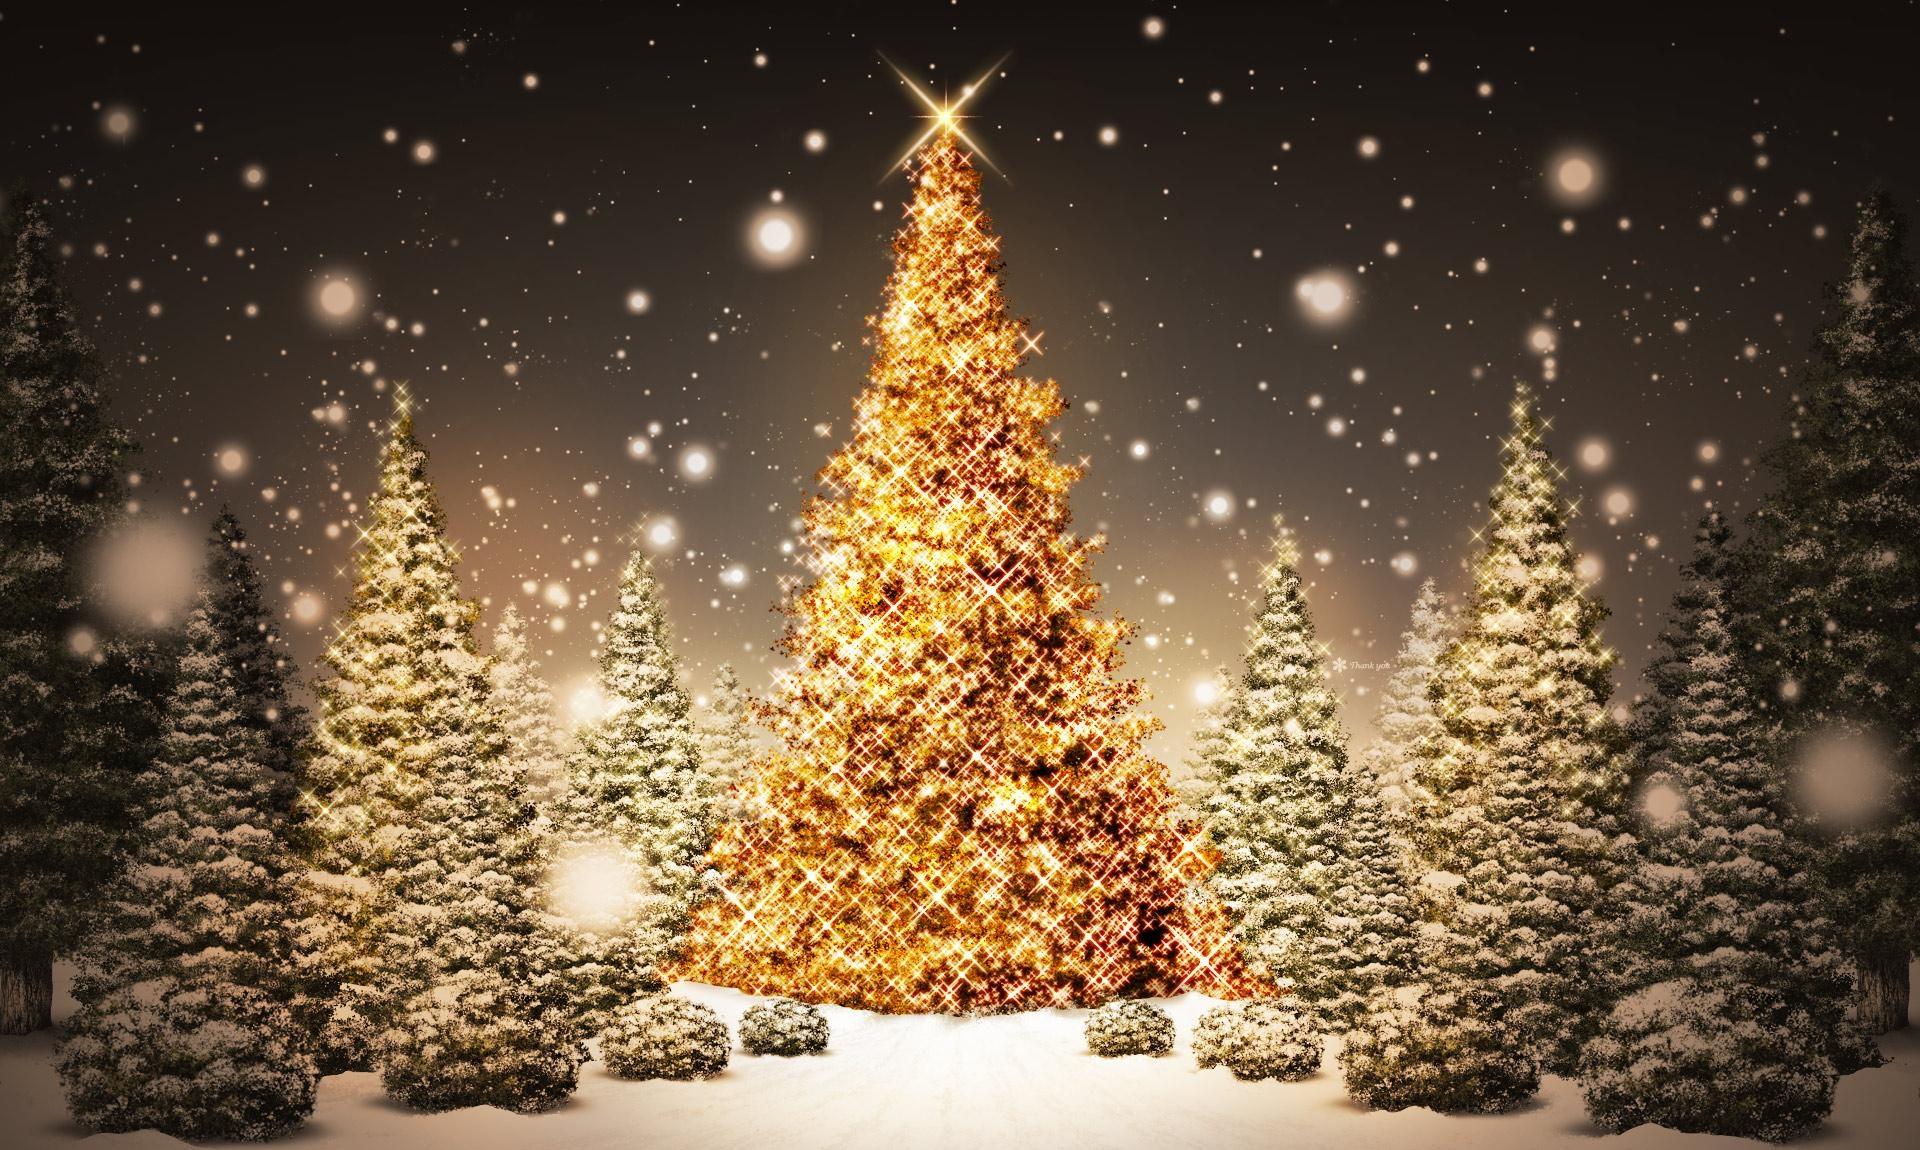 Wallpaper Trees Night Snow Wood Branch Christmas Tree